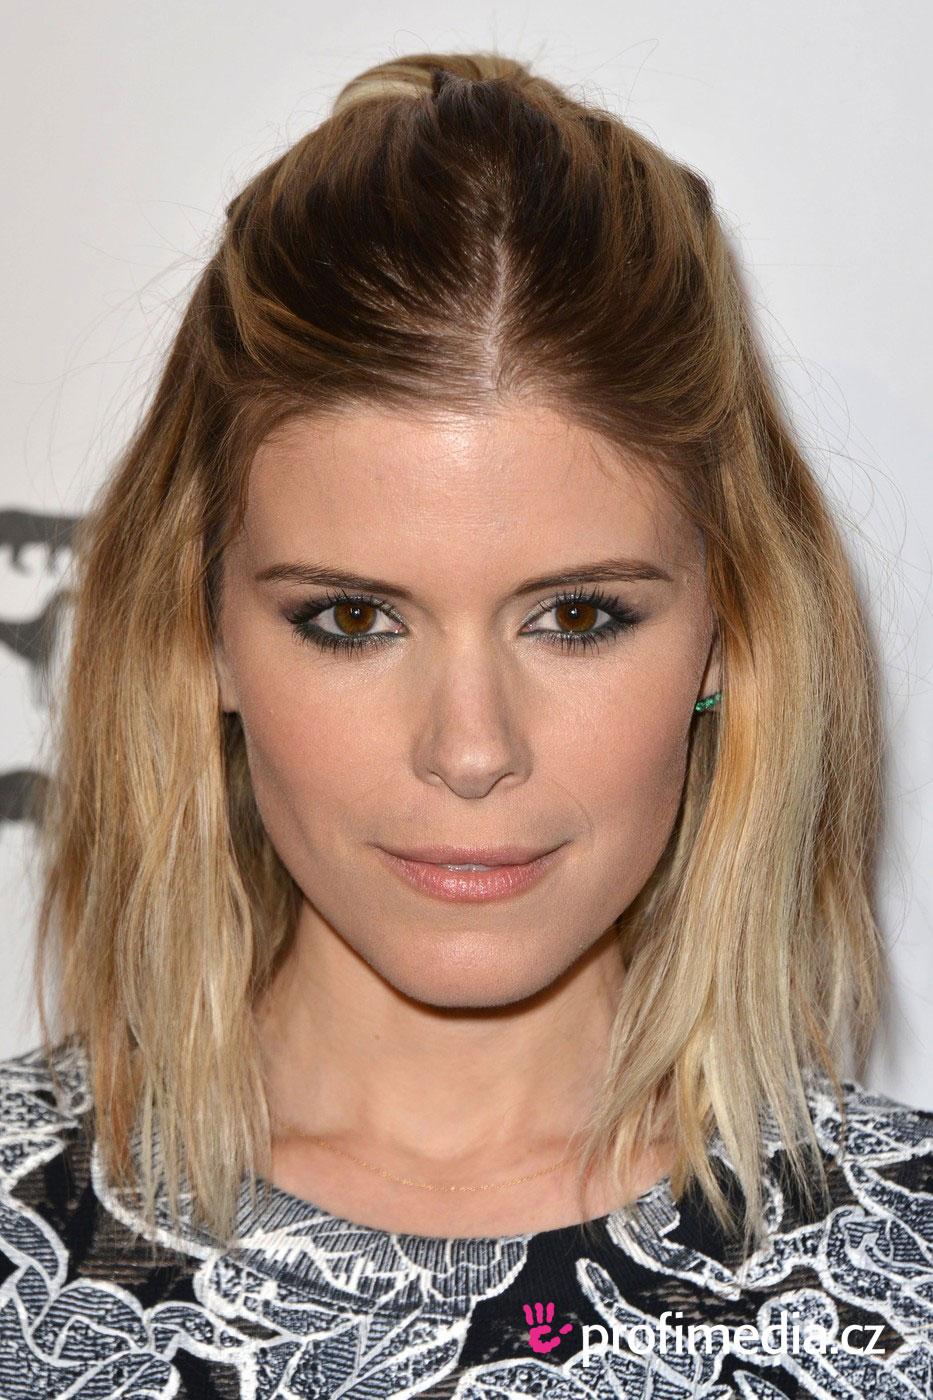 Kate Mara Hairstyle Easyhairstyler